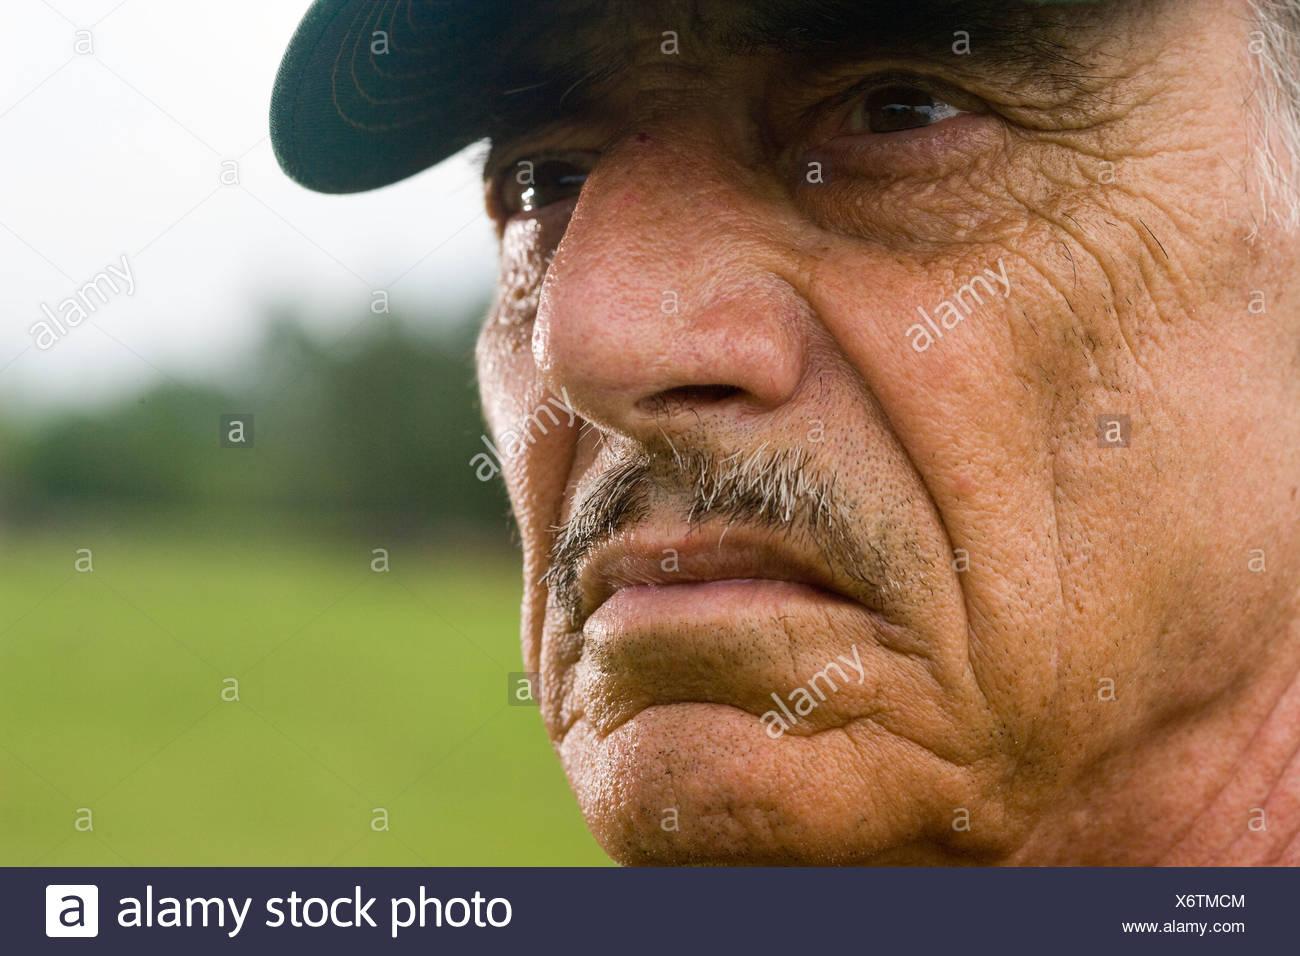 Close-up of smiling man wearing cap Photo Stock